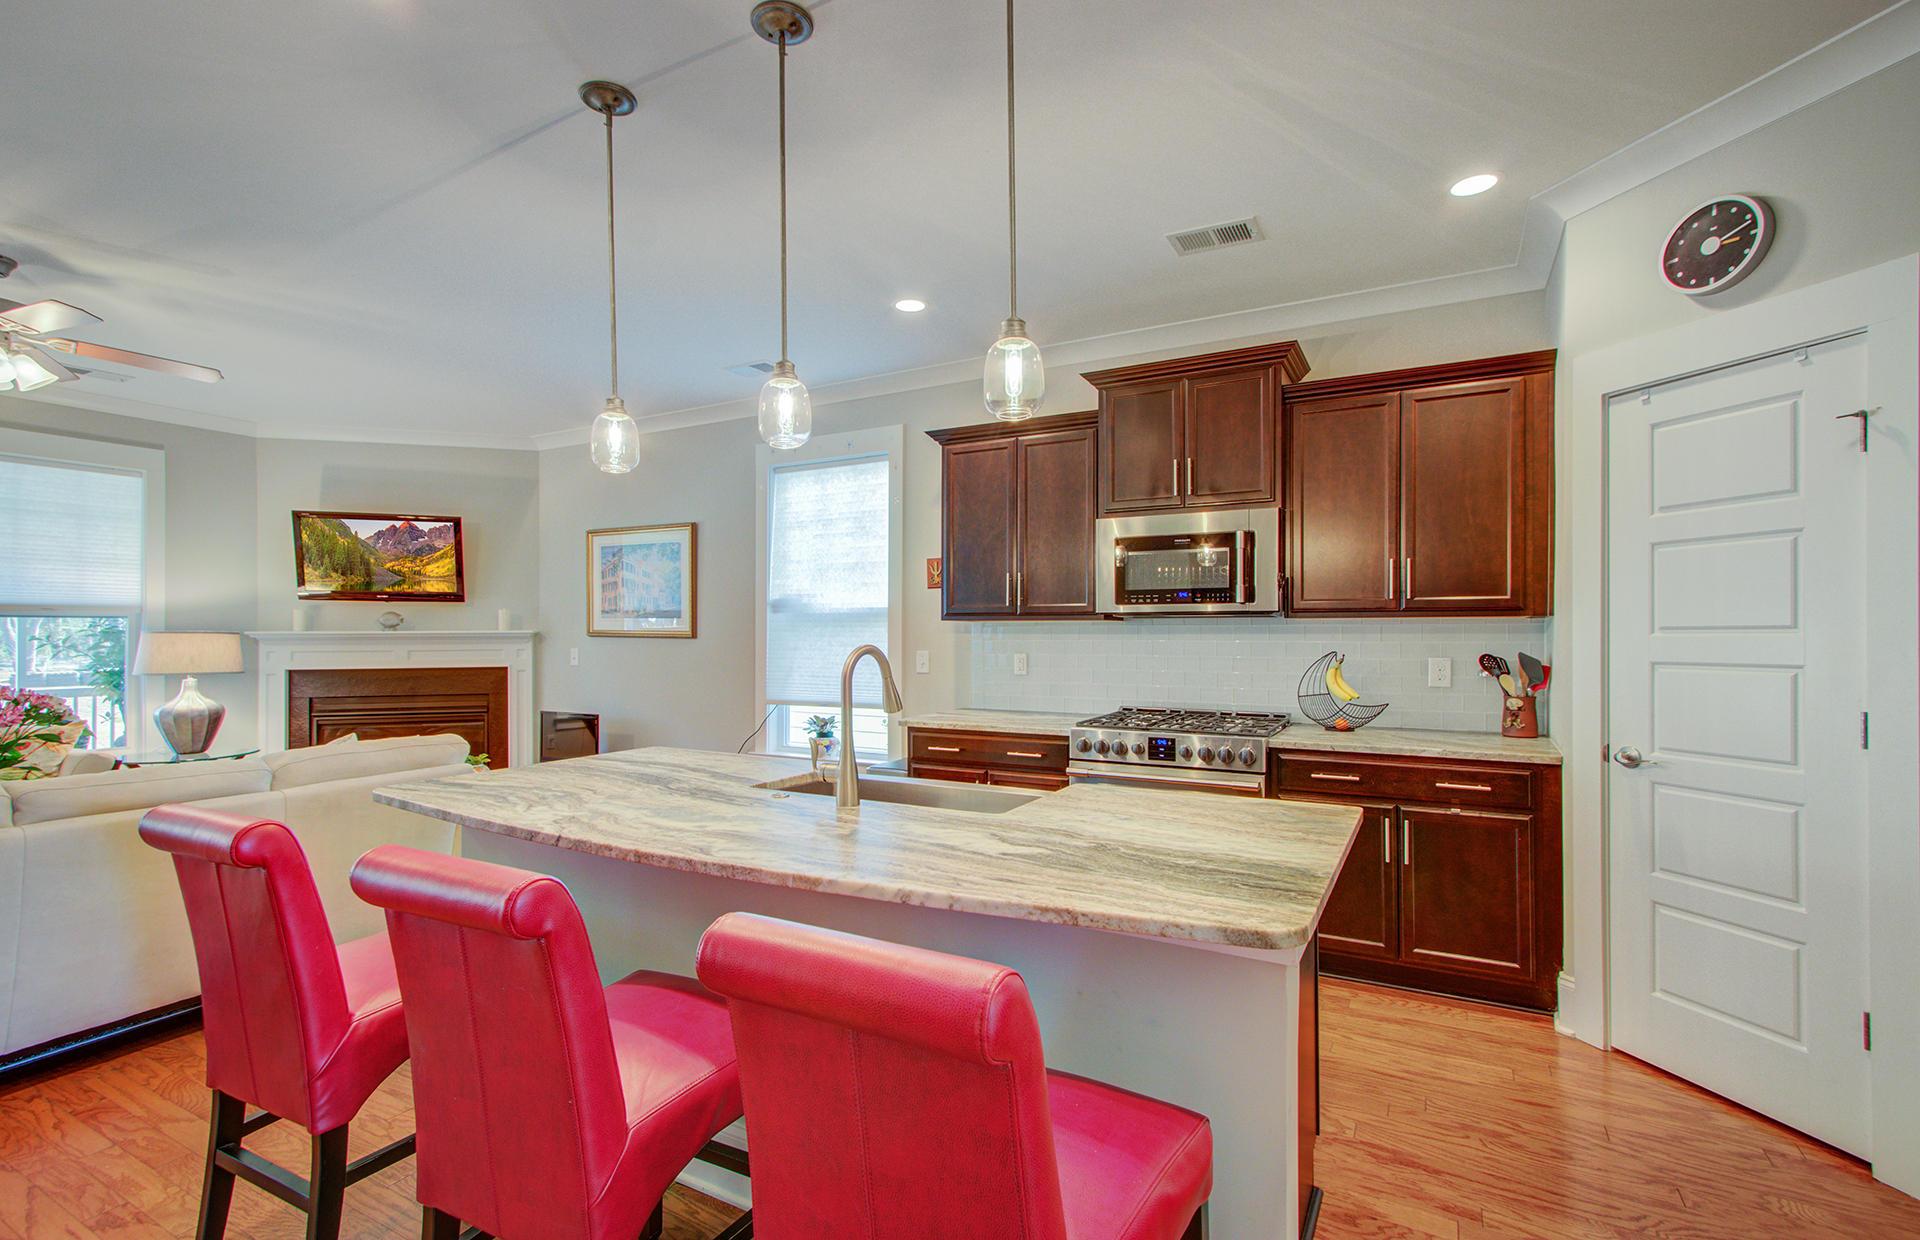 Stonoview Homes For Sale - 2639 Colonel Harrison, Johns Island, SC - 6